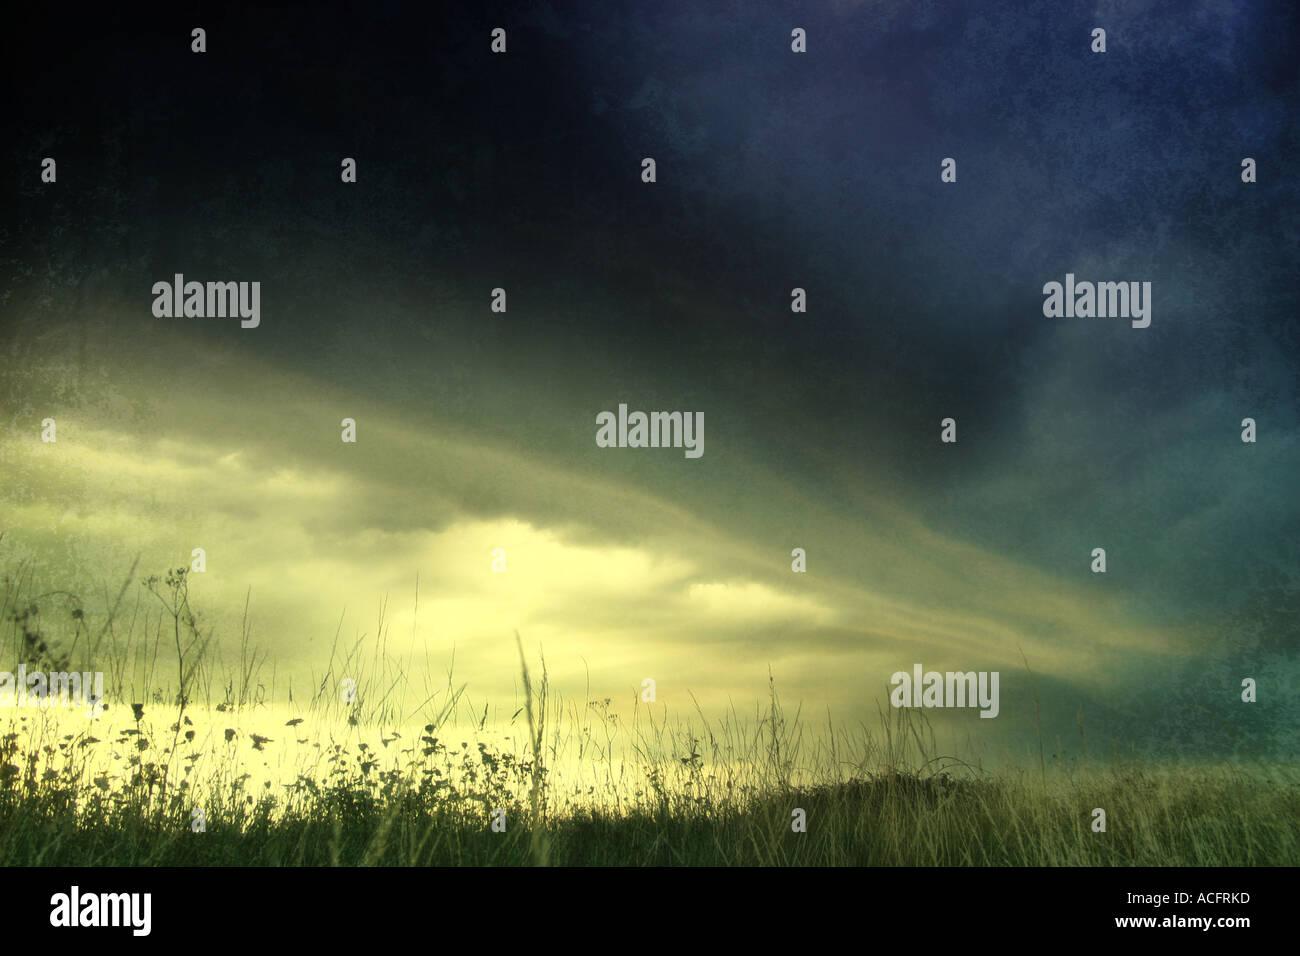 Foto de un cielo tormentoso Imagen De Stock